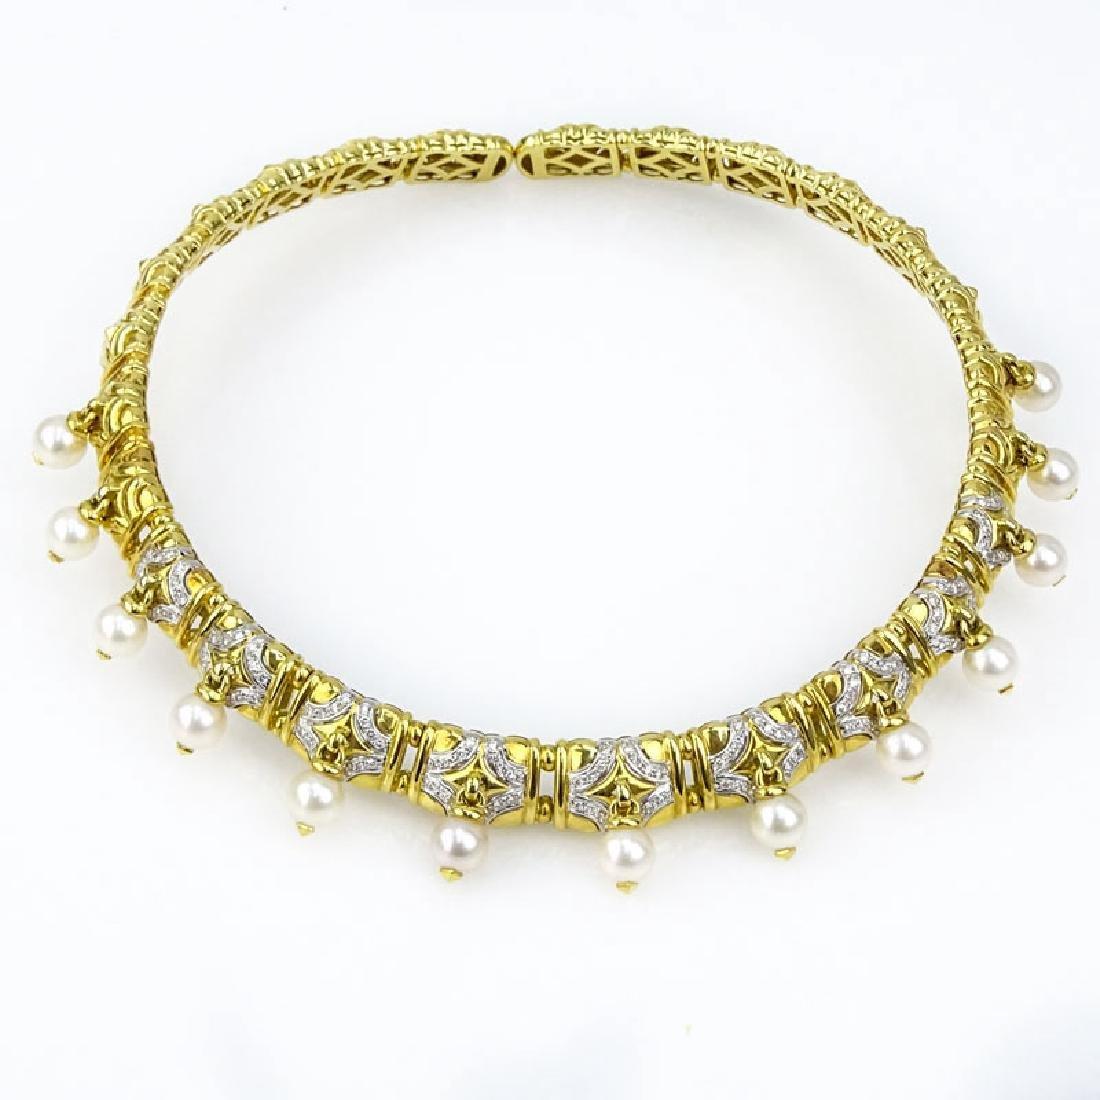 Vintage Bulgari style Heavy 18 Karat Yellow Gold, Pave